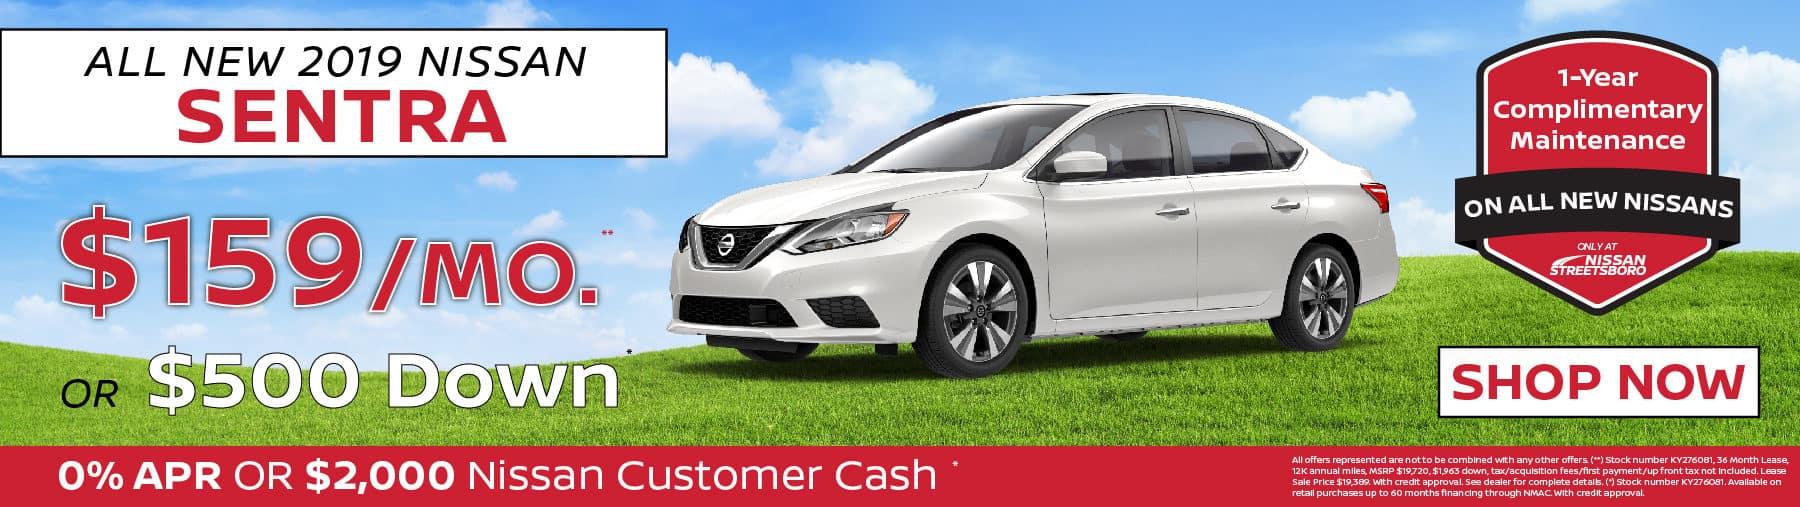 Nissan Sentra Special Ohio